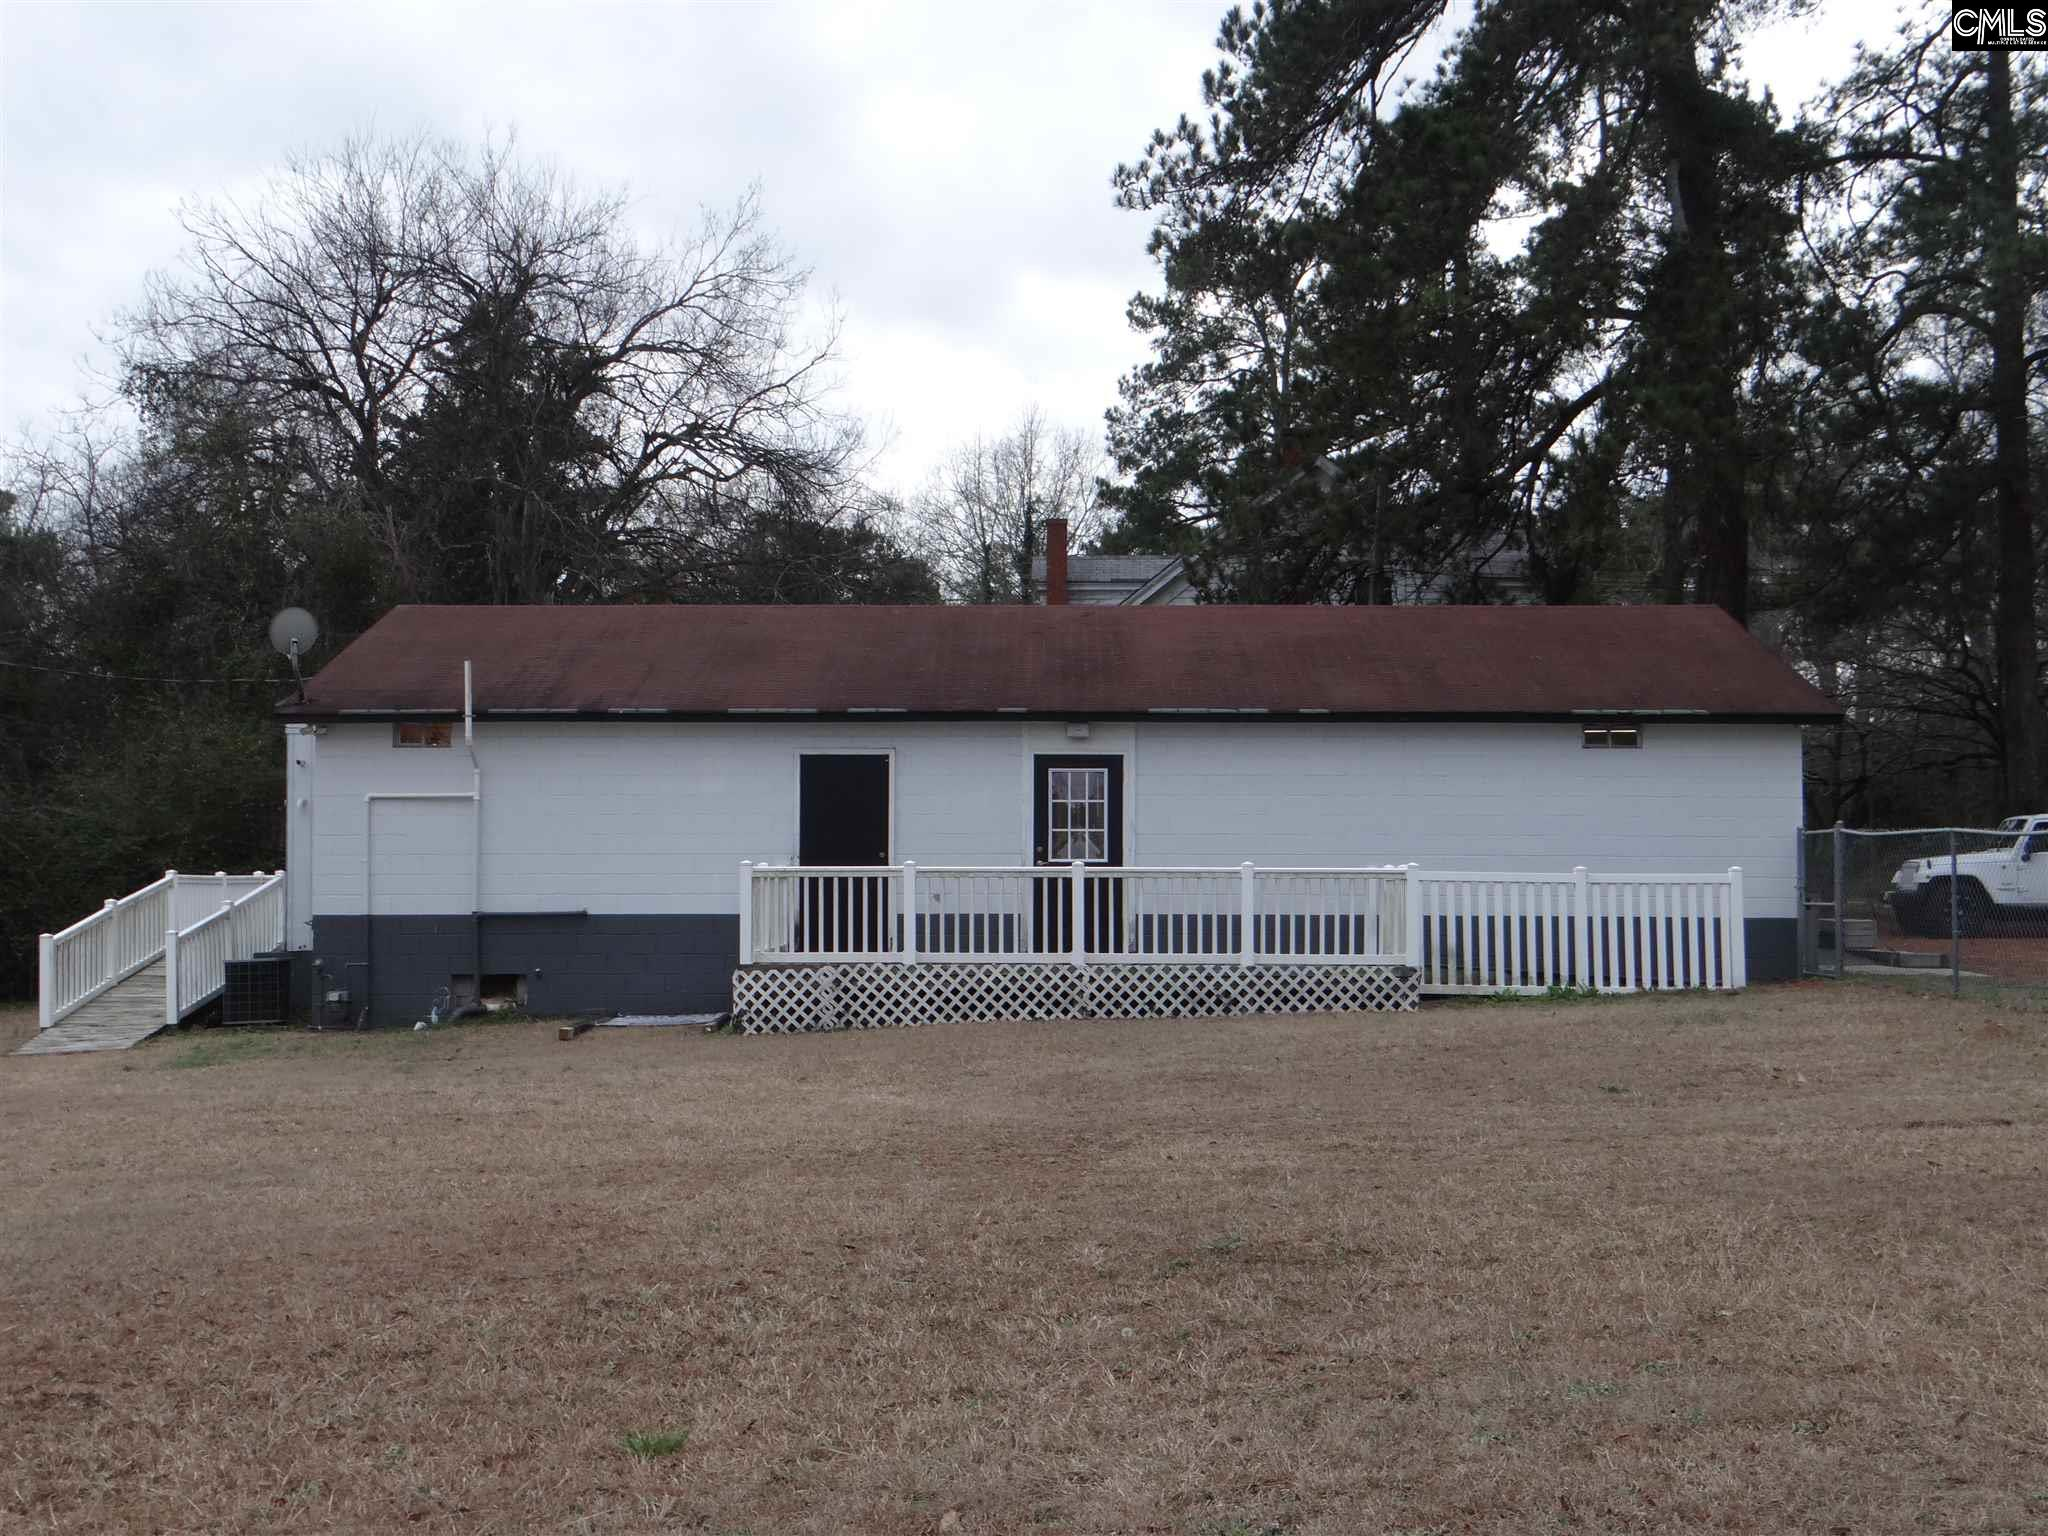 532 W Columbia Ave Batesburg, SC 29006